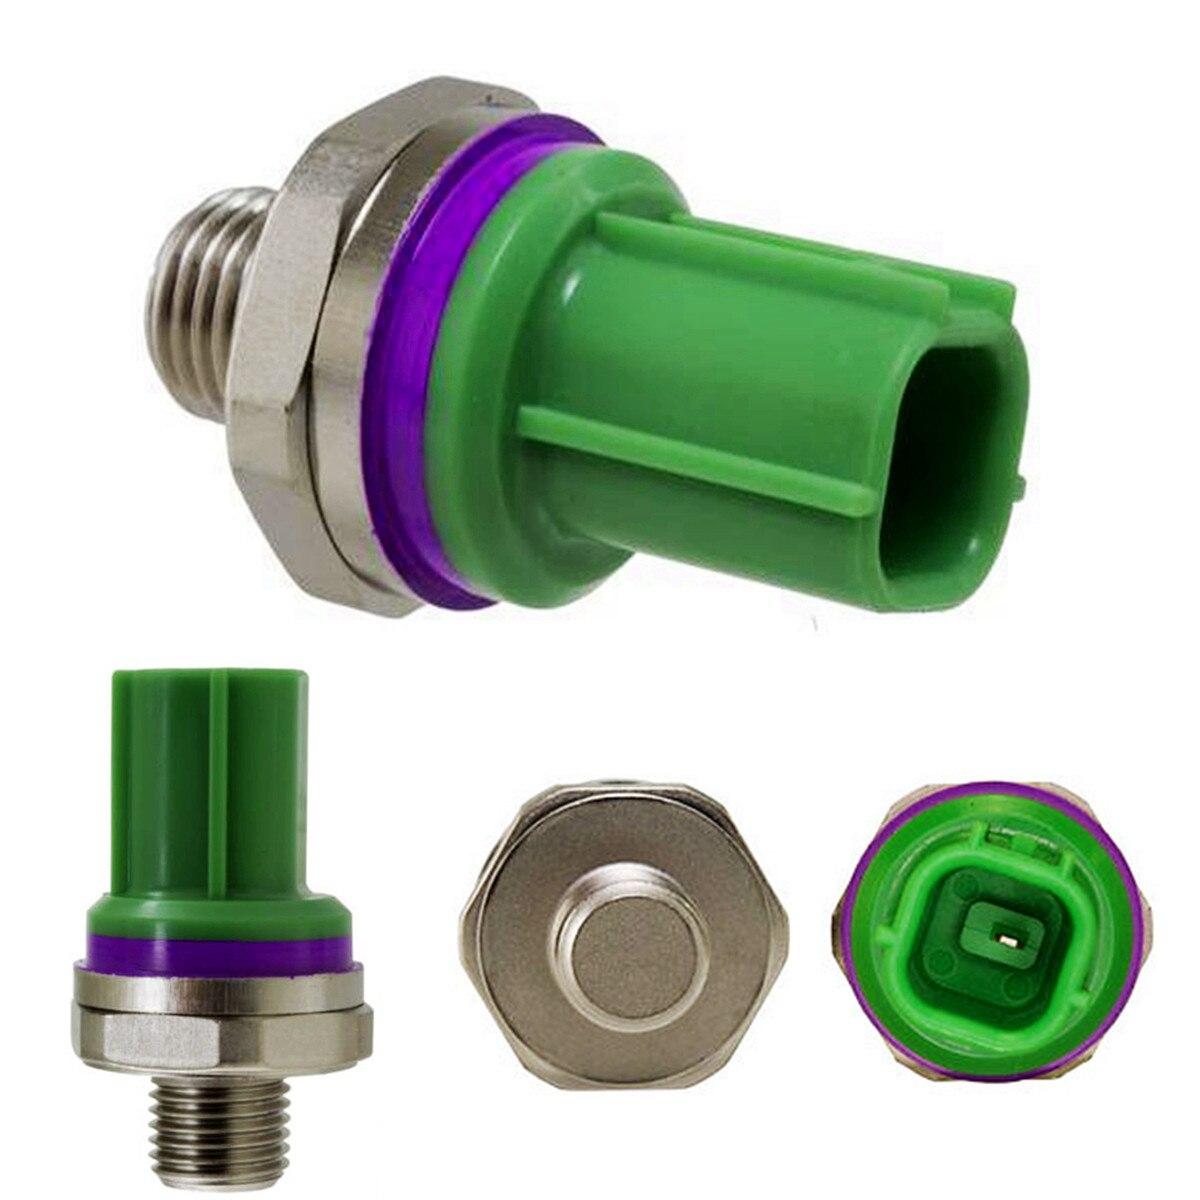 Di Knock Sensor Per Honda/Civic si 2006 2007 2008 2009 2010 2011 30530-PRC-003 KS300 5S9087